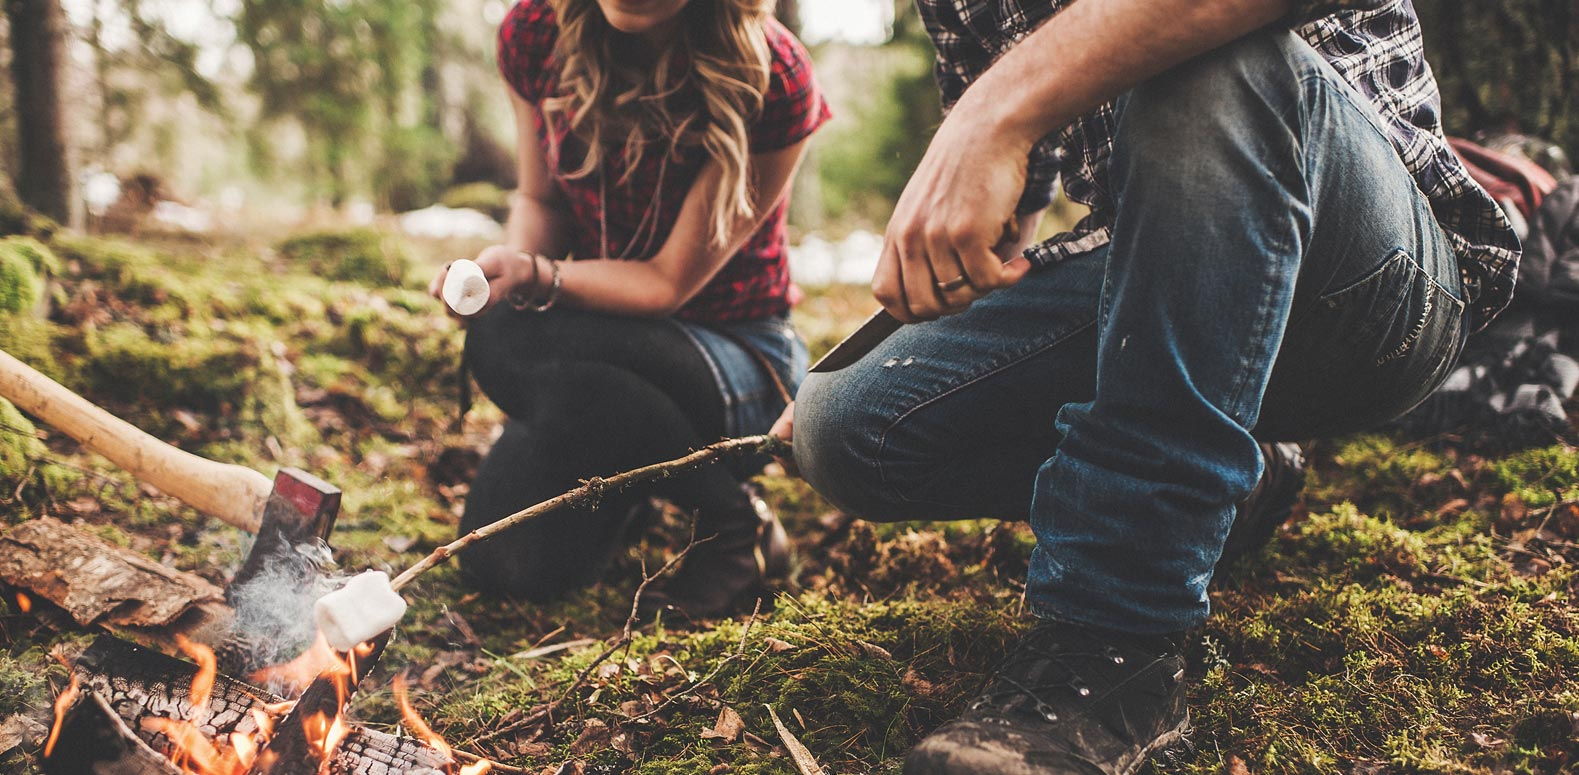 Wilderness Gathering Festival Image